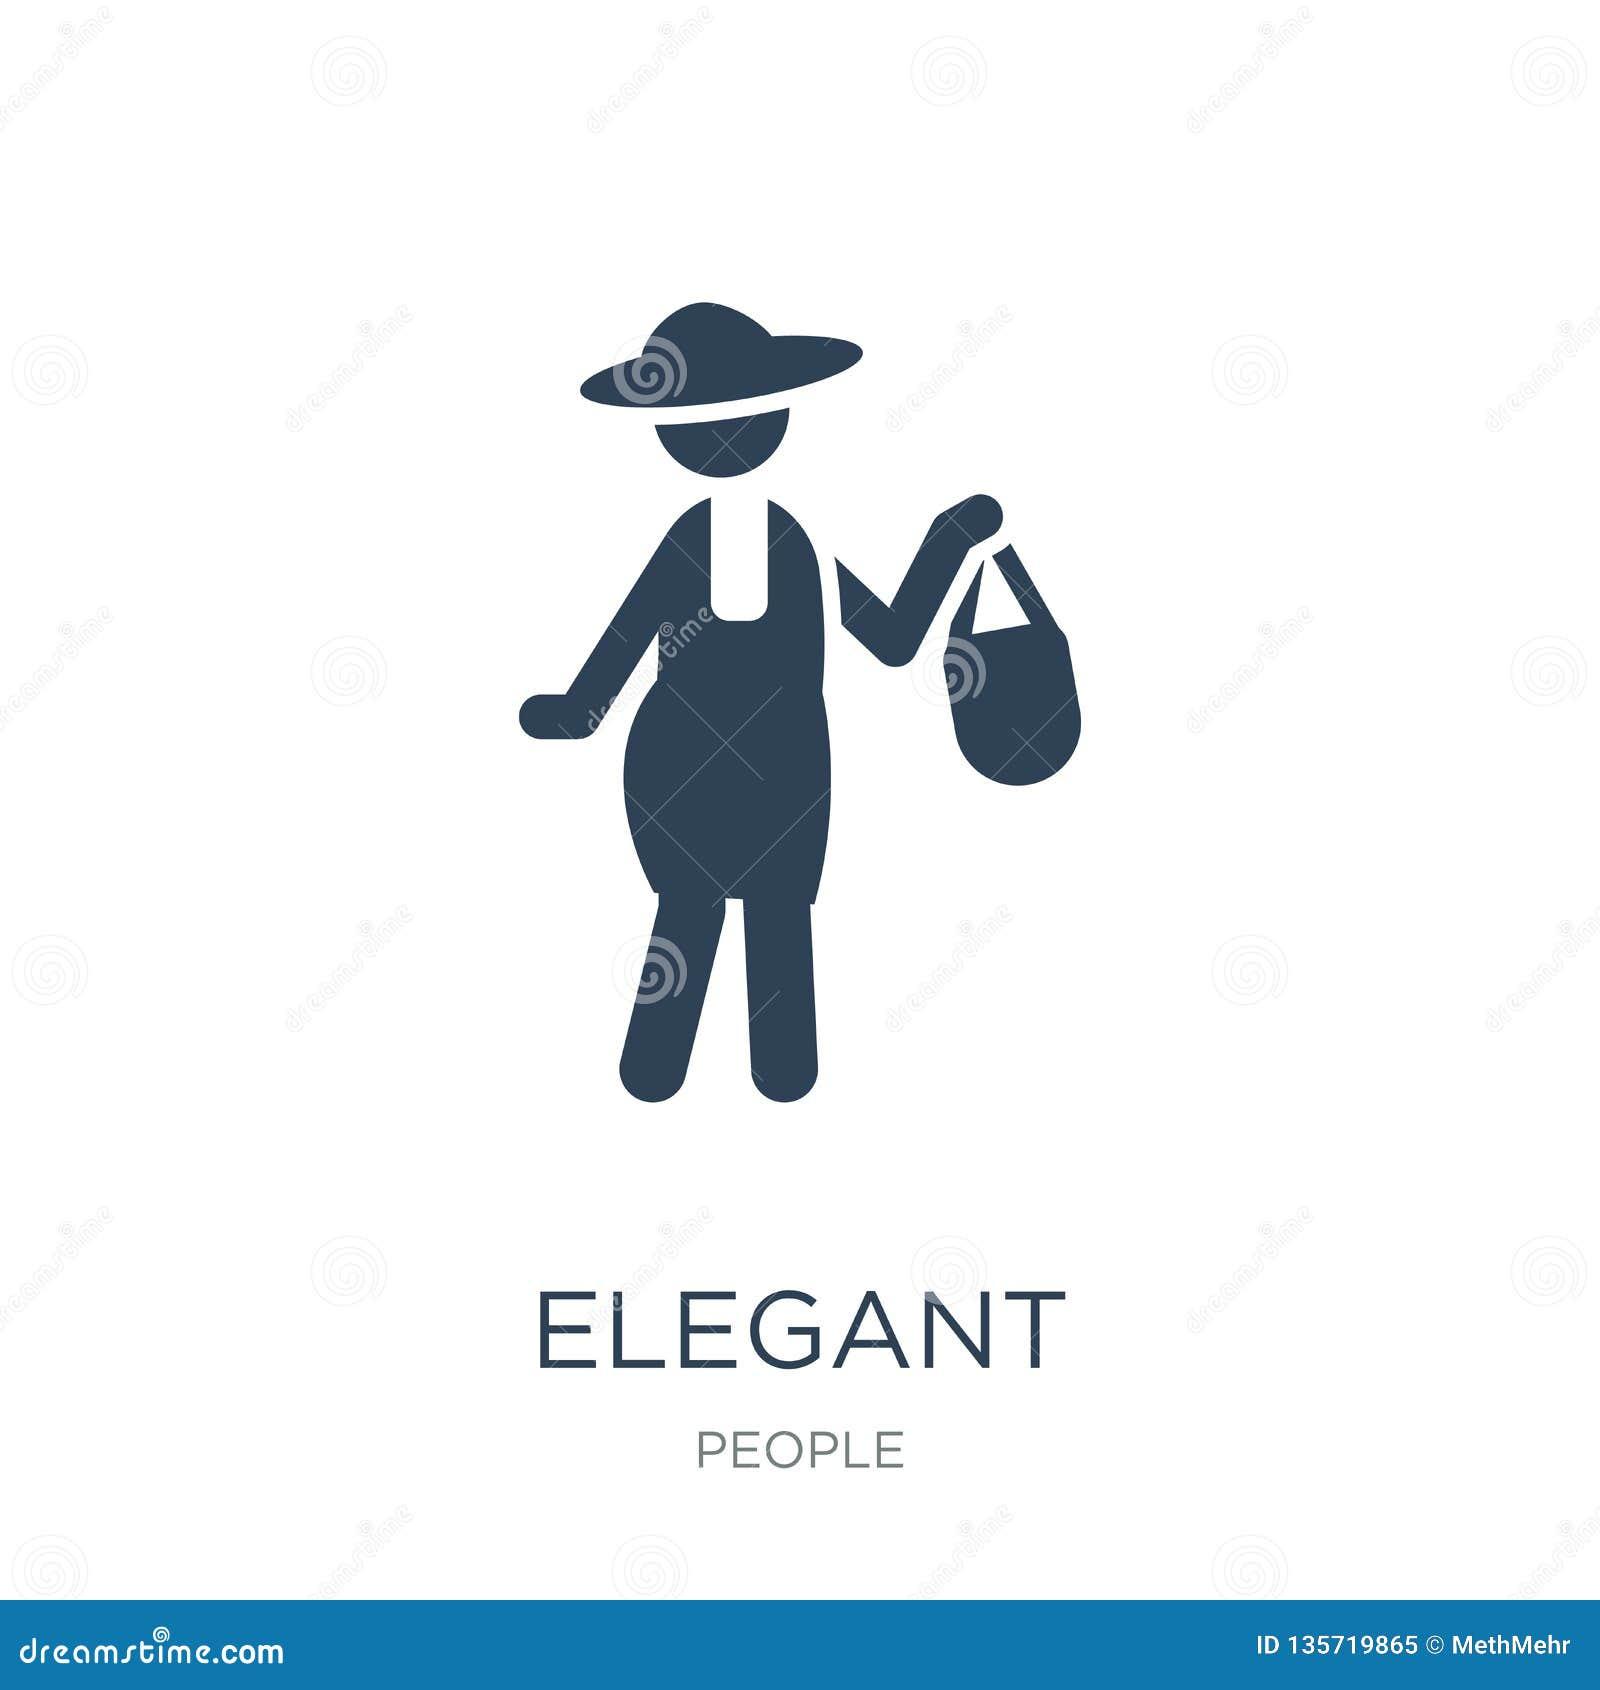 elegant icon in trendy design style. elegant icon isolated on white background. elegant vector icon simple and modern flat symbol